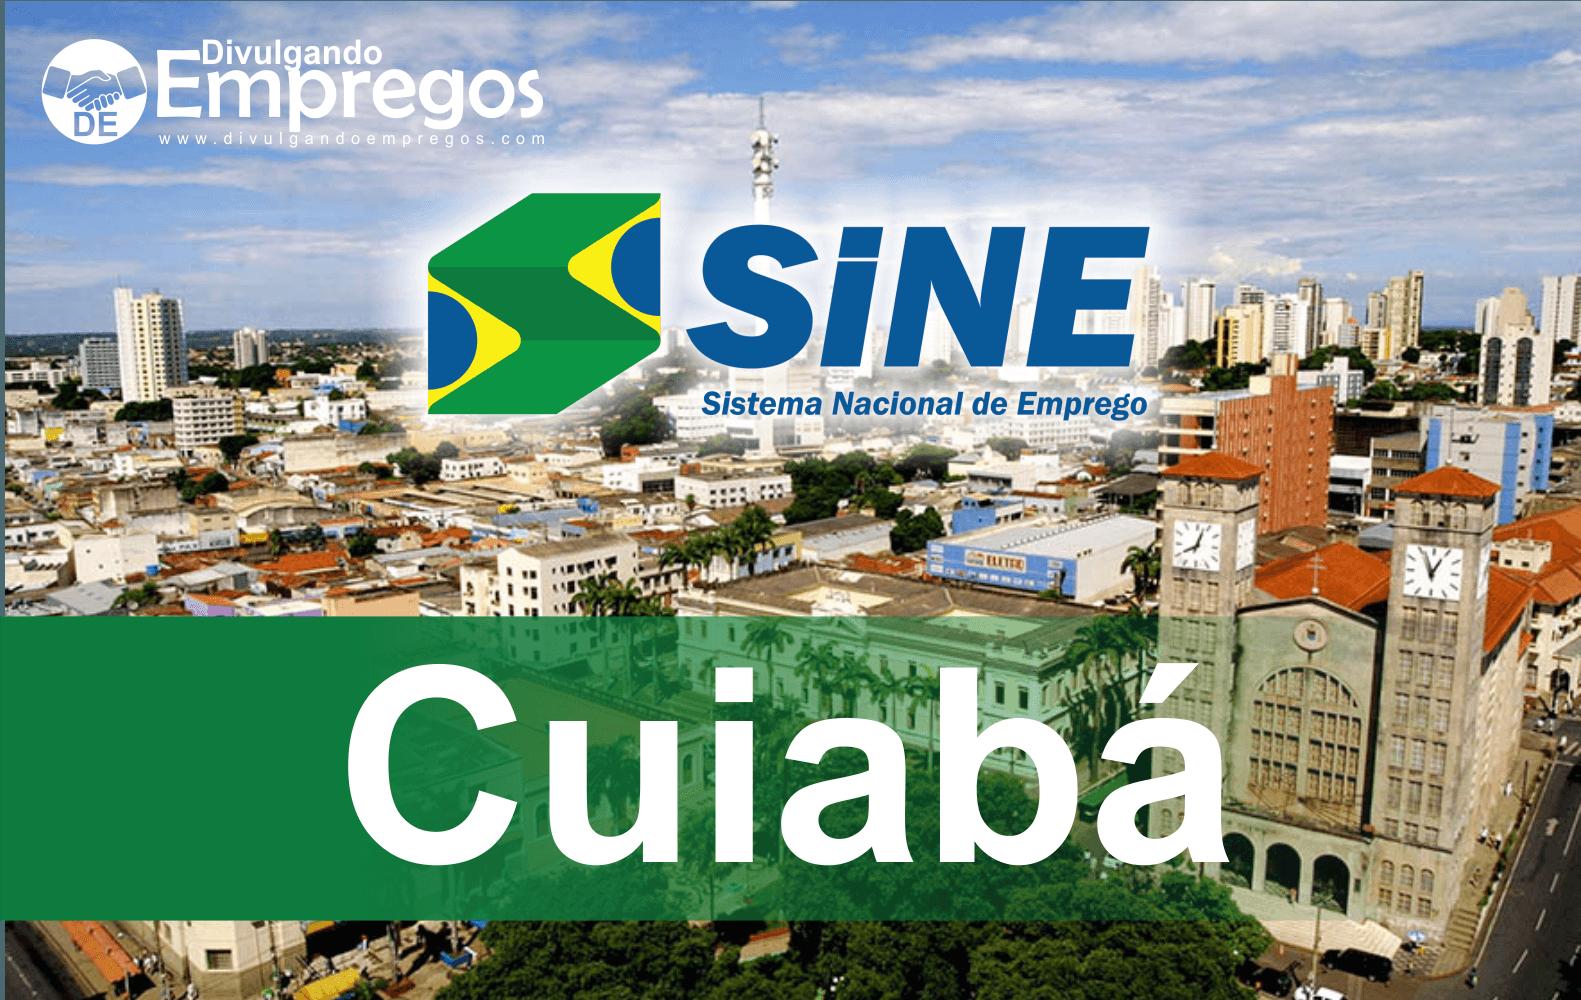 Sine Cuiabá